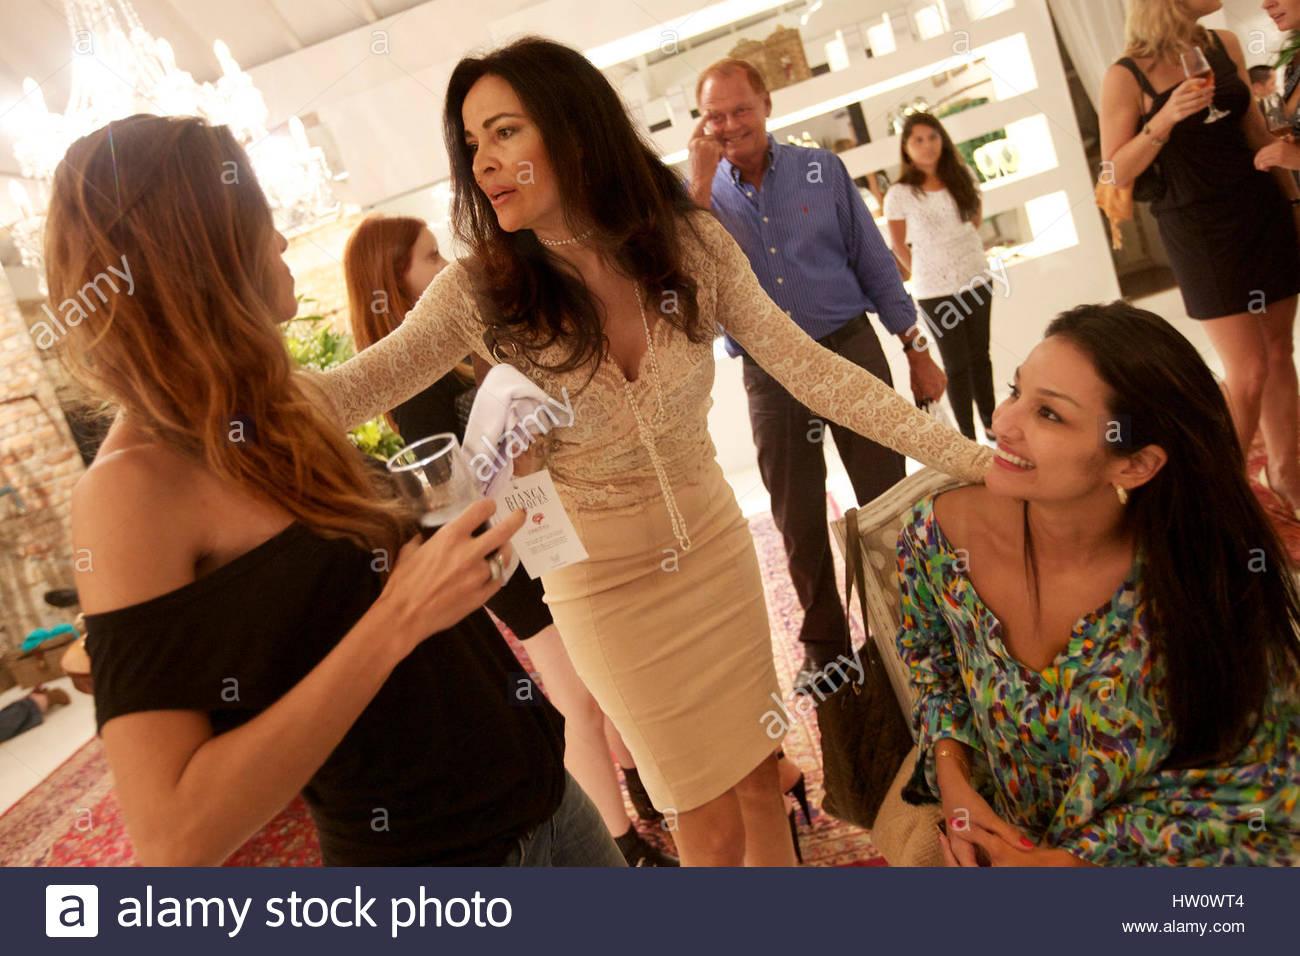 High society women gather at an expensive fashion event in Rio de Janeiro, Brazil. - Stock Image